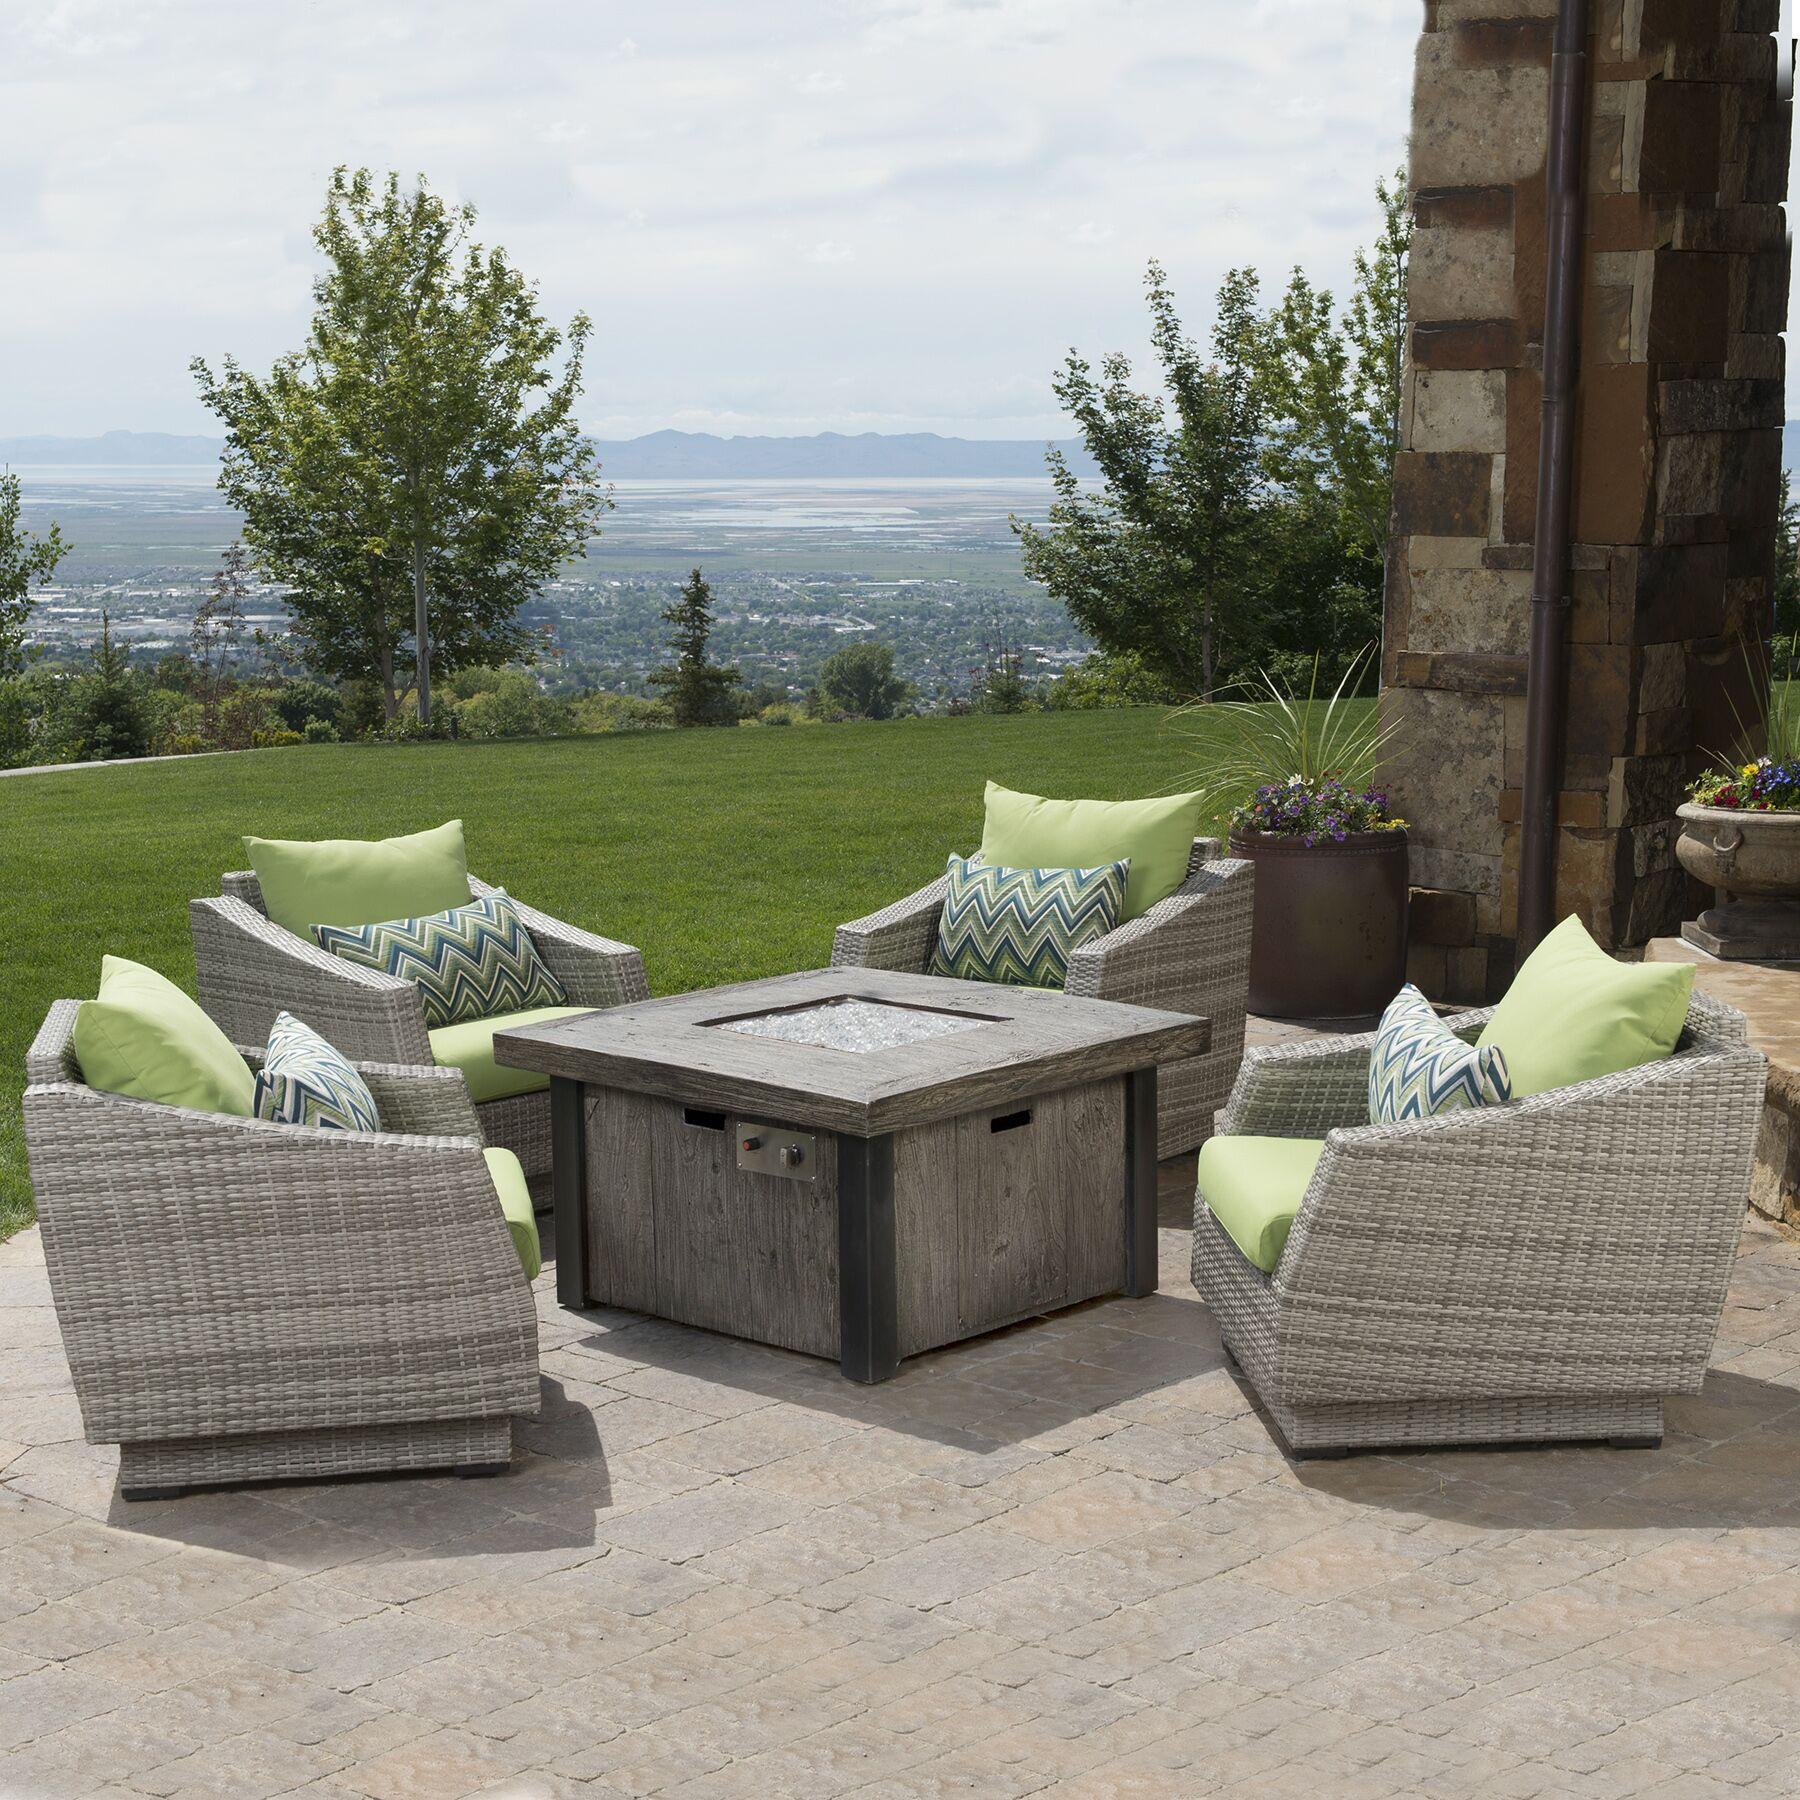 Castelli 5 Piece Conversation Set with Cushions Fabric: Ginkgo Green